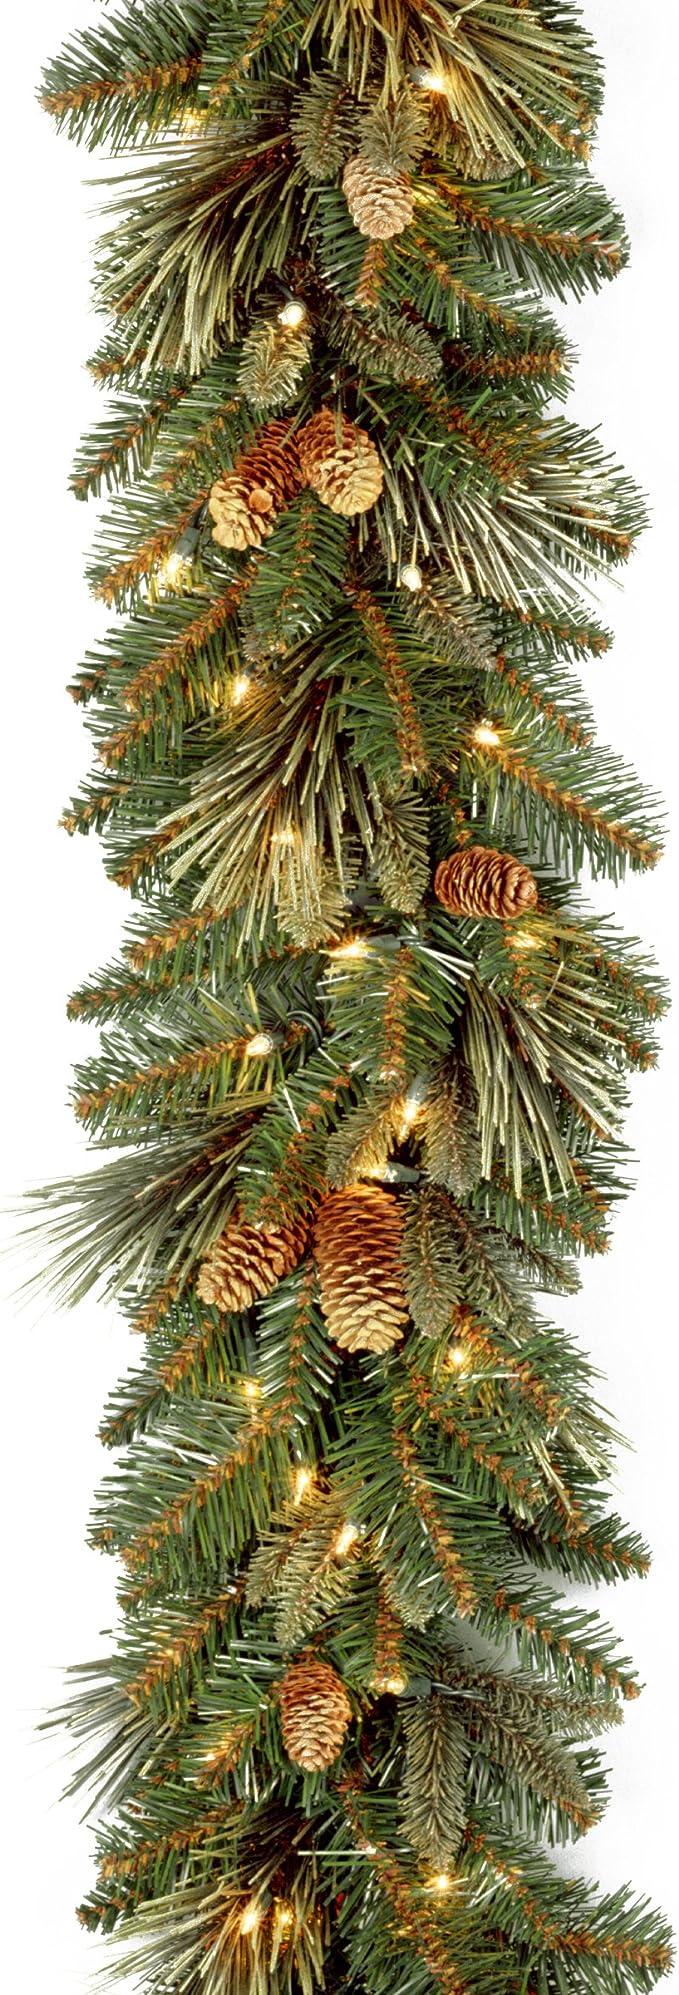 National Tree Carolina Pine Garland With Clear Lights 9 Feet Home Kitchen